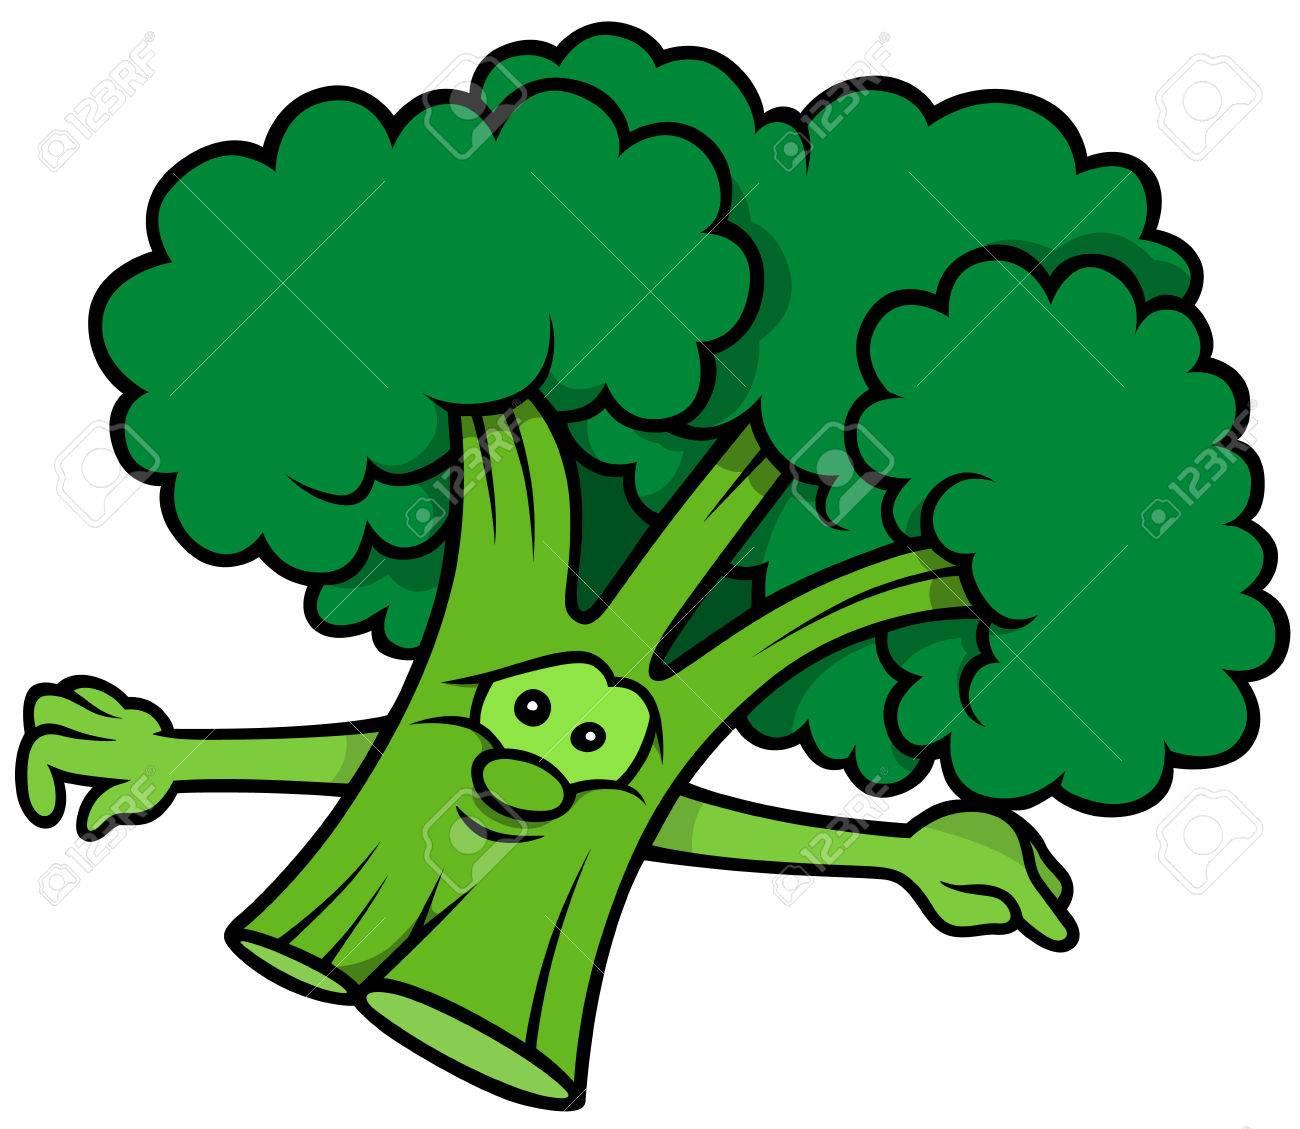 Broccoli clipart animated. Cute free on dumielauxepices